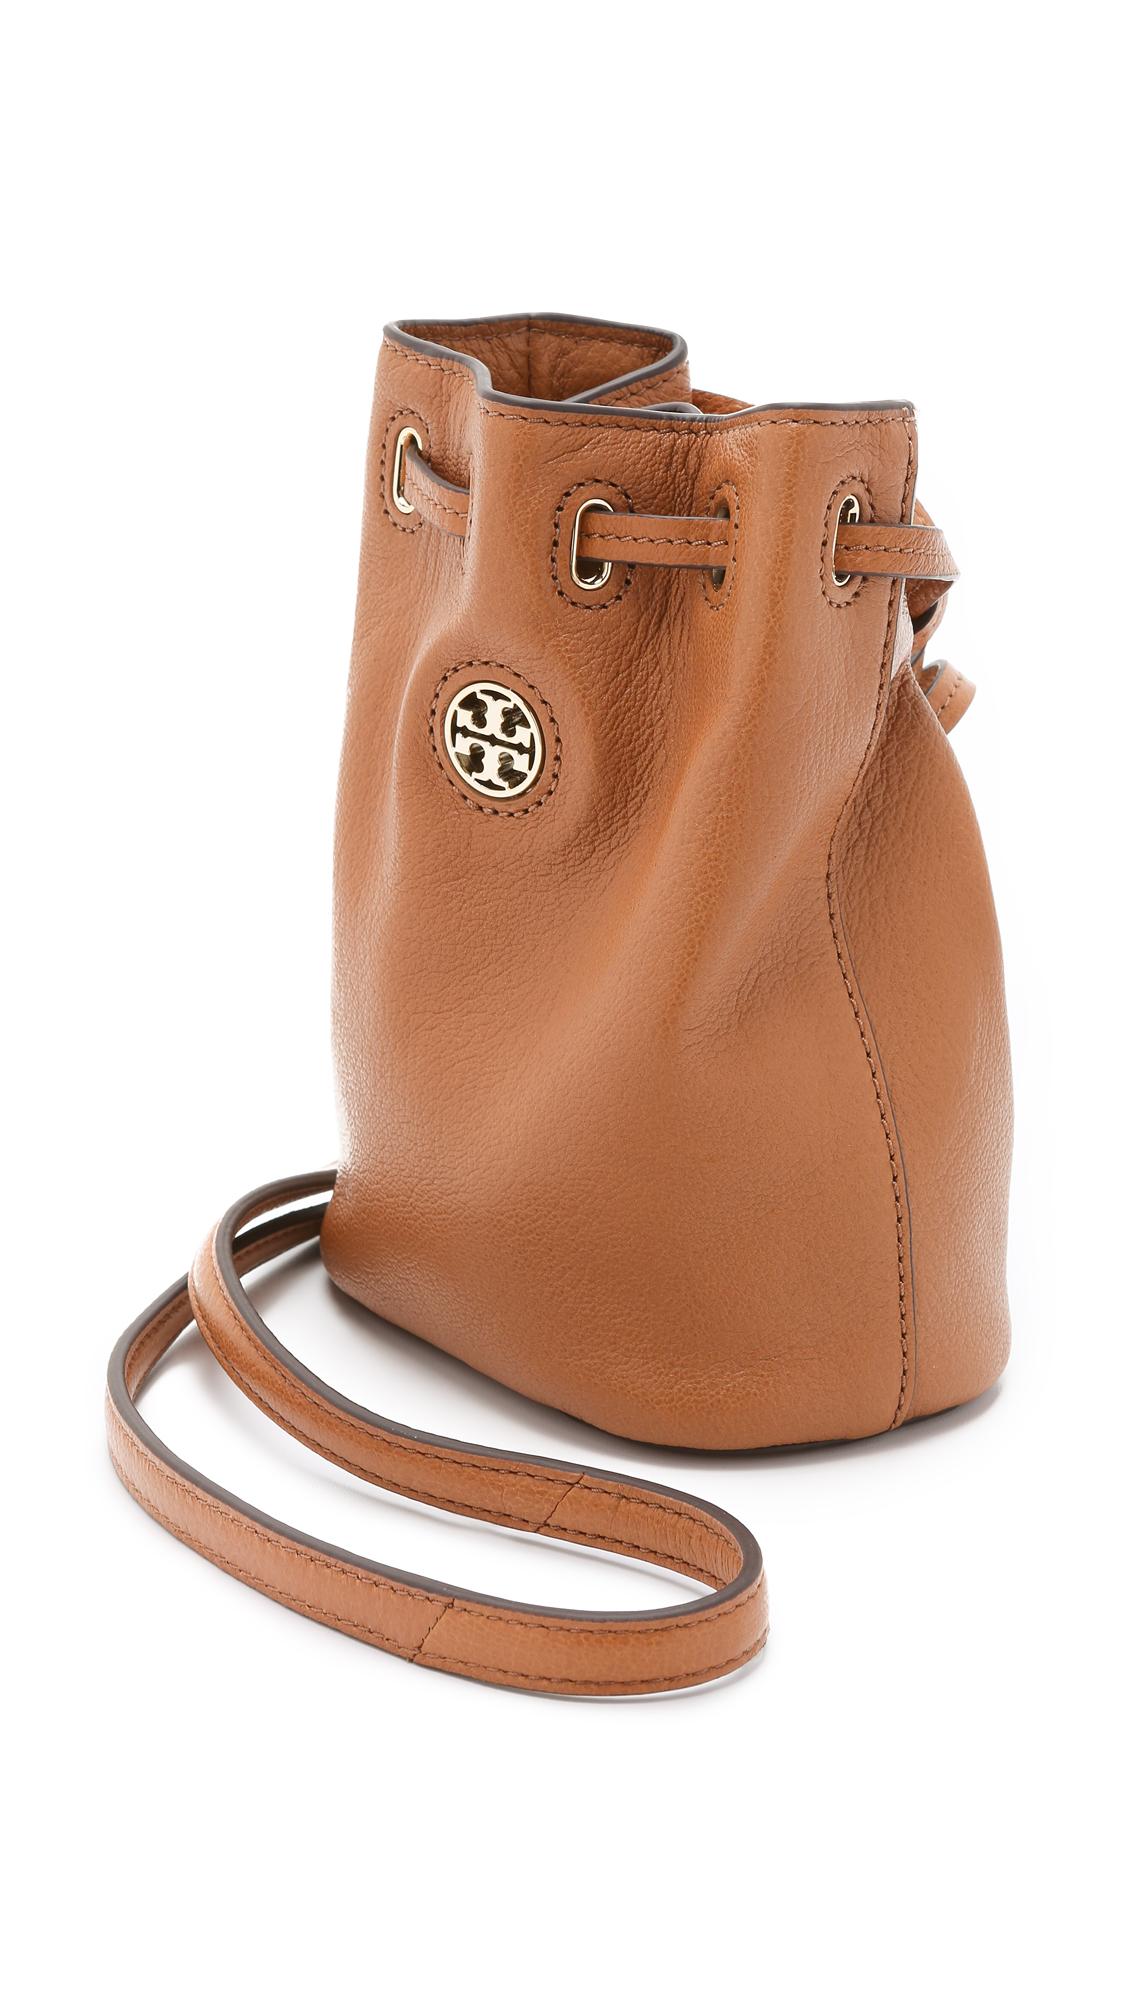 77a1daba670 ... 50% off tory burch brody mini bucket bag shopbop ac018 d74b4 ...